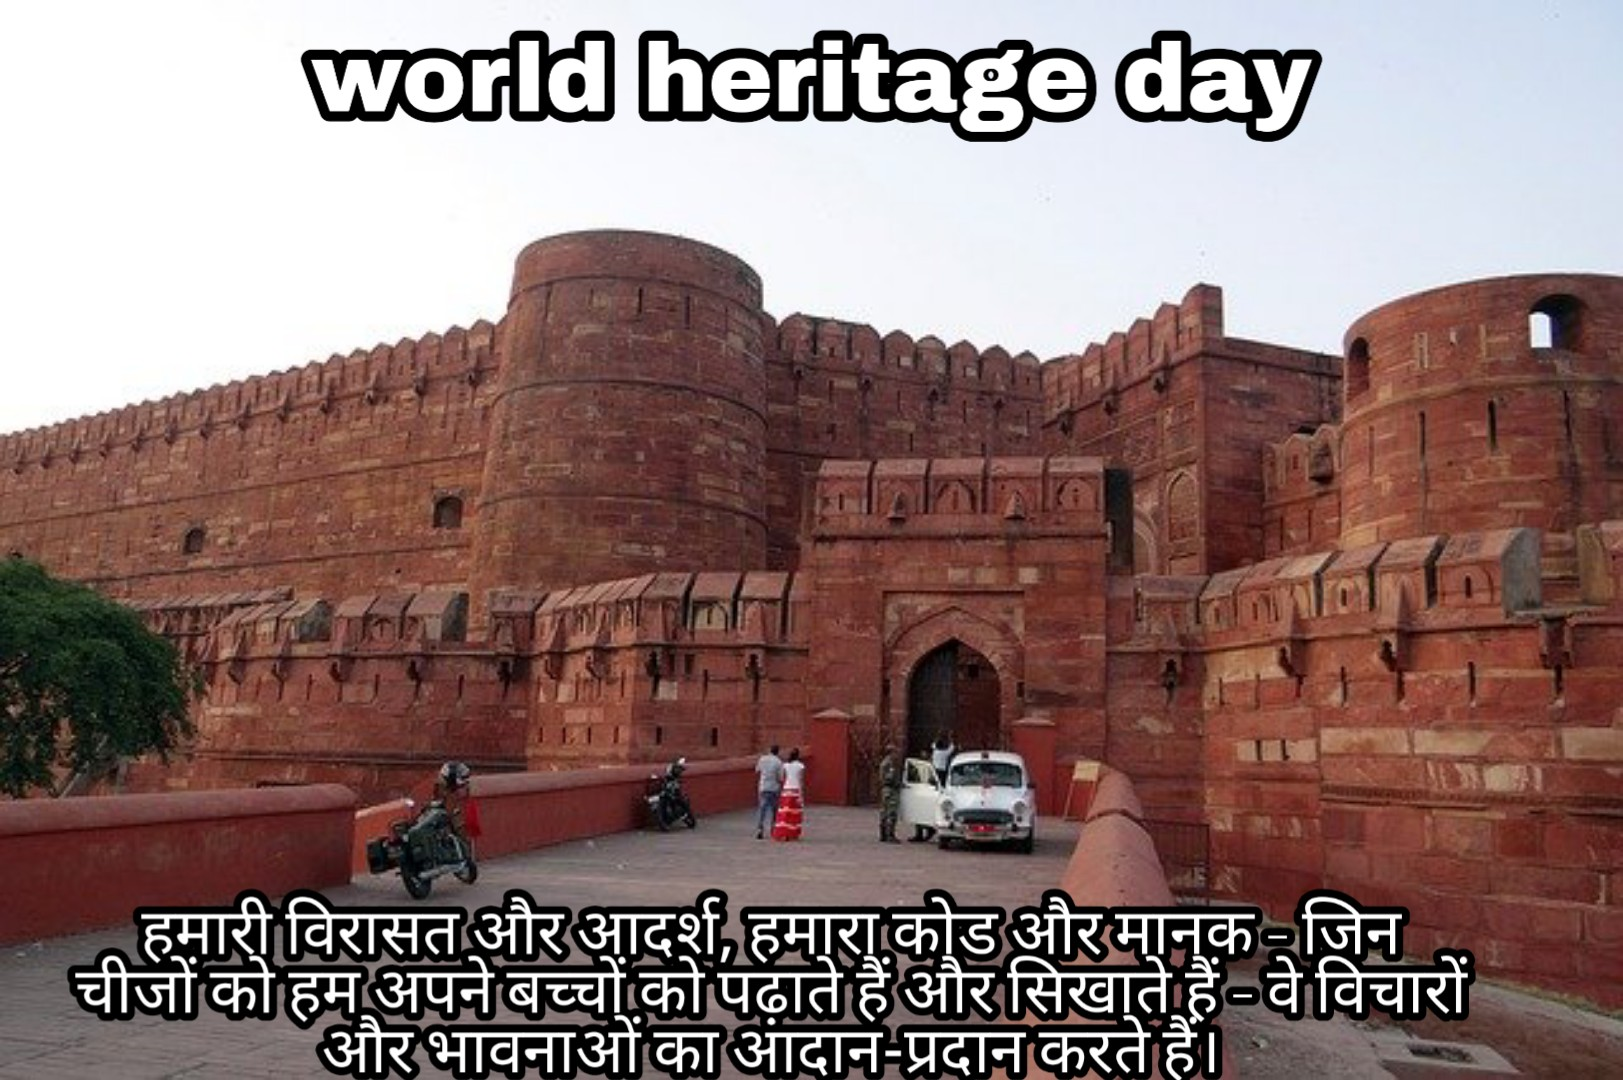 Photo of World heritage day wishes shayari quotes sms 2020